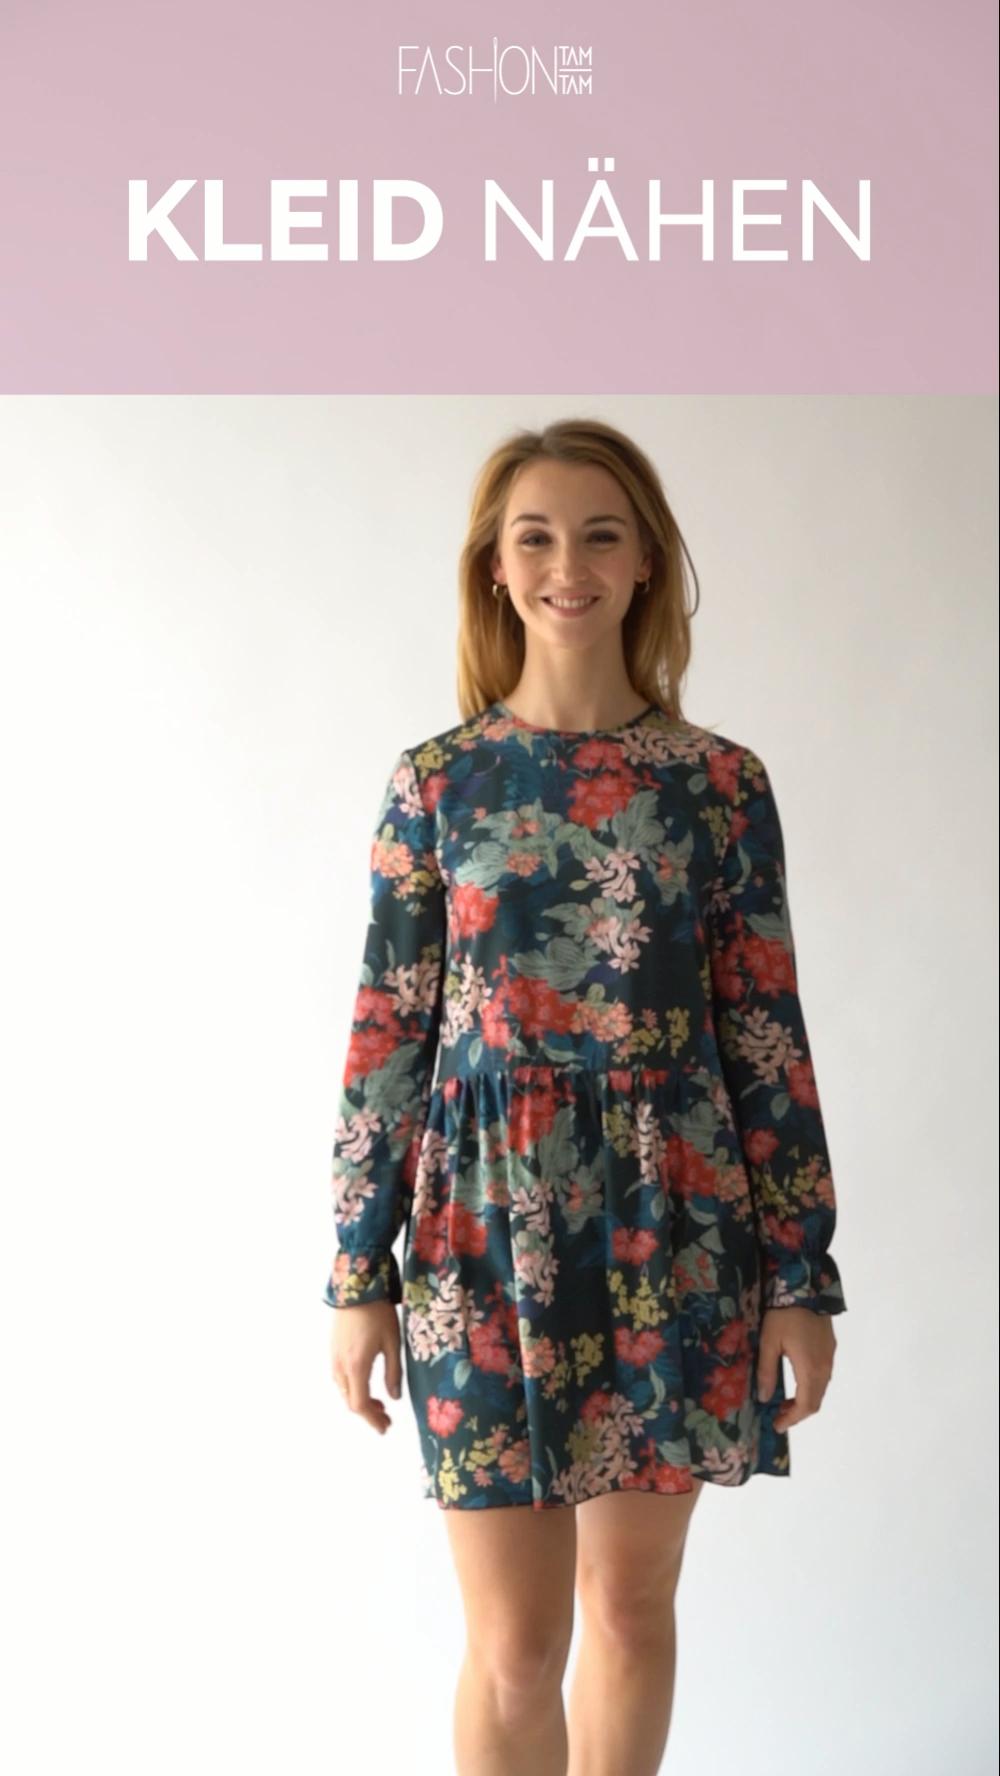 Photo of Kleid nähen – Schritt-für-Schritt Nähanleitung